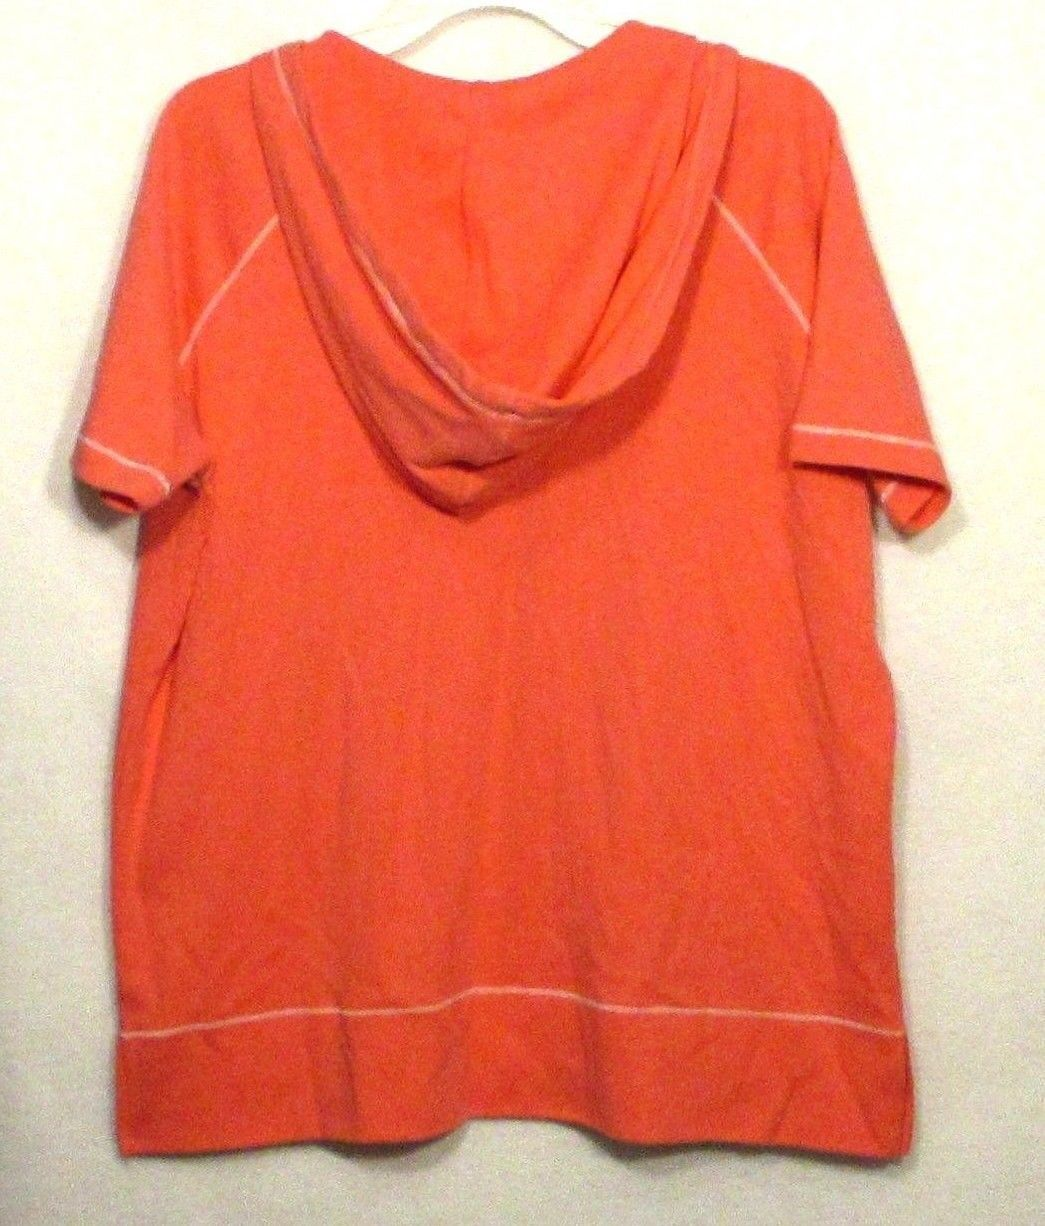 Eddie Bauer XL Shirt Top Coral Pink Short Sleeve Hooded Cotton Womens Women B3